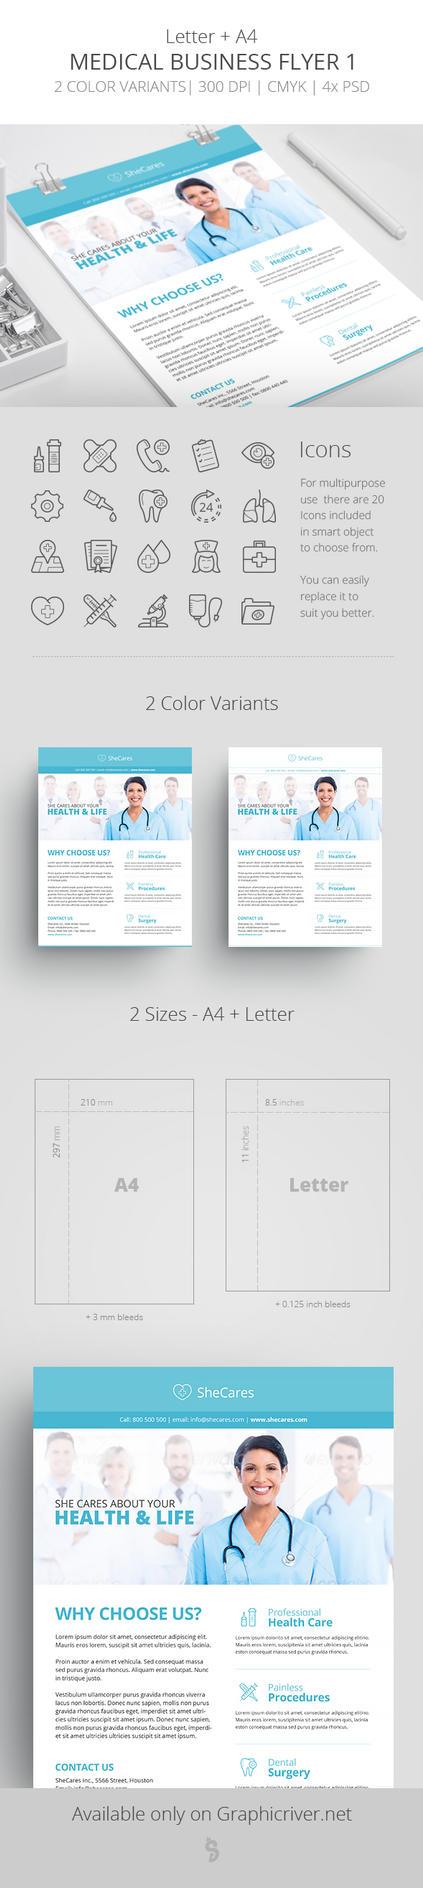 Medical Business Flyer Template 1 by survivorcz